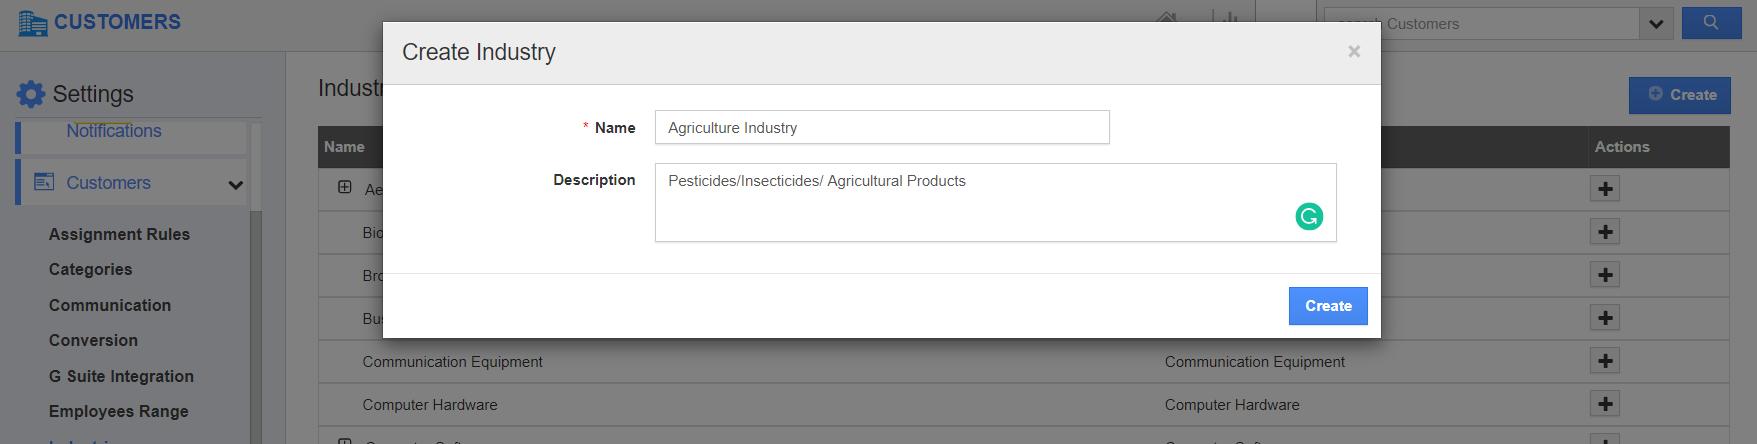 Create Industry Type